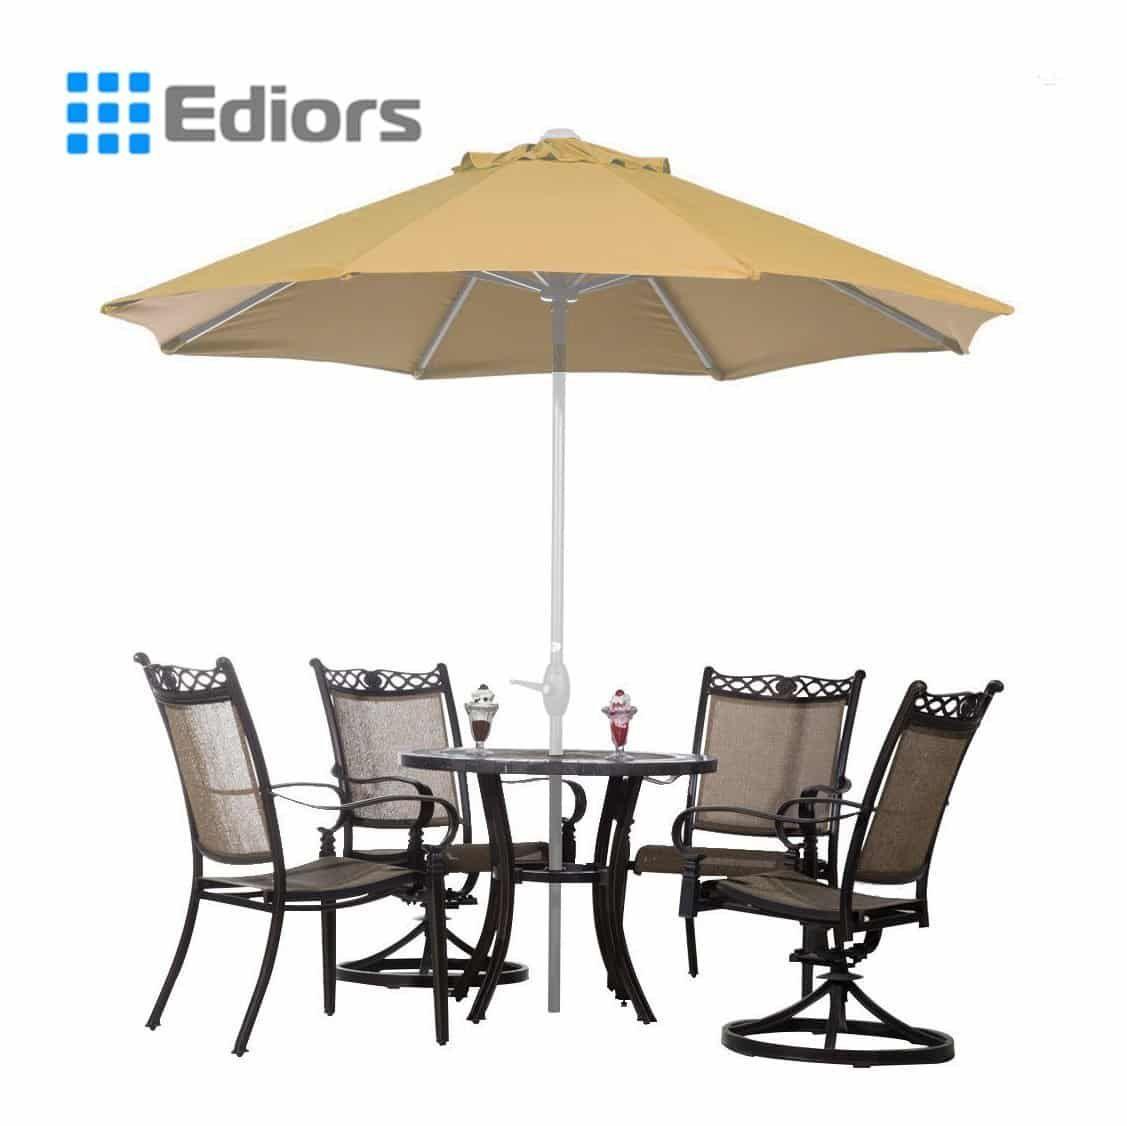 Ediors® Deluxe Ivory 9 Ft Cantilever Hanging Patio Umbrella Freestanding  Outdoor Parasol Adjustable Market Umbrella